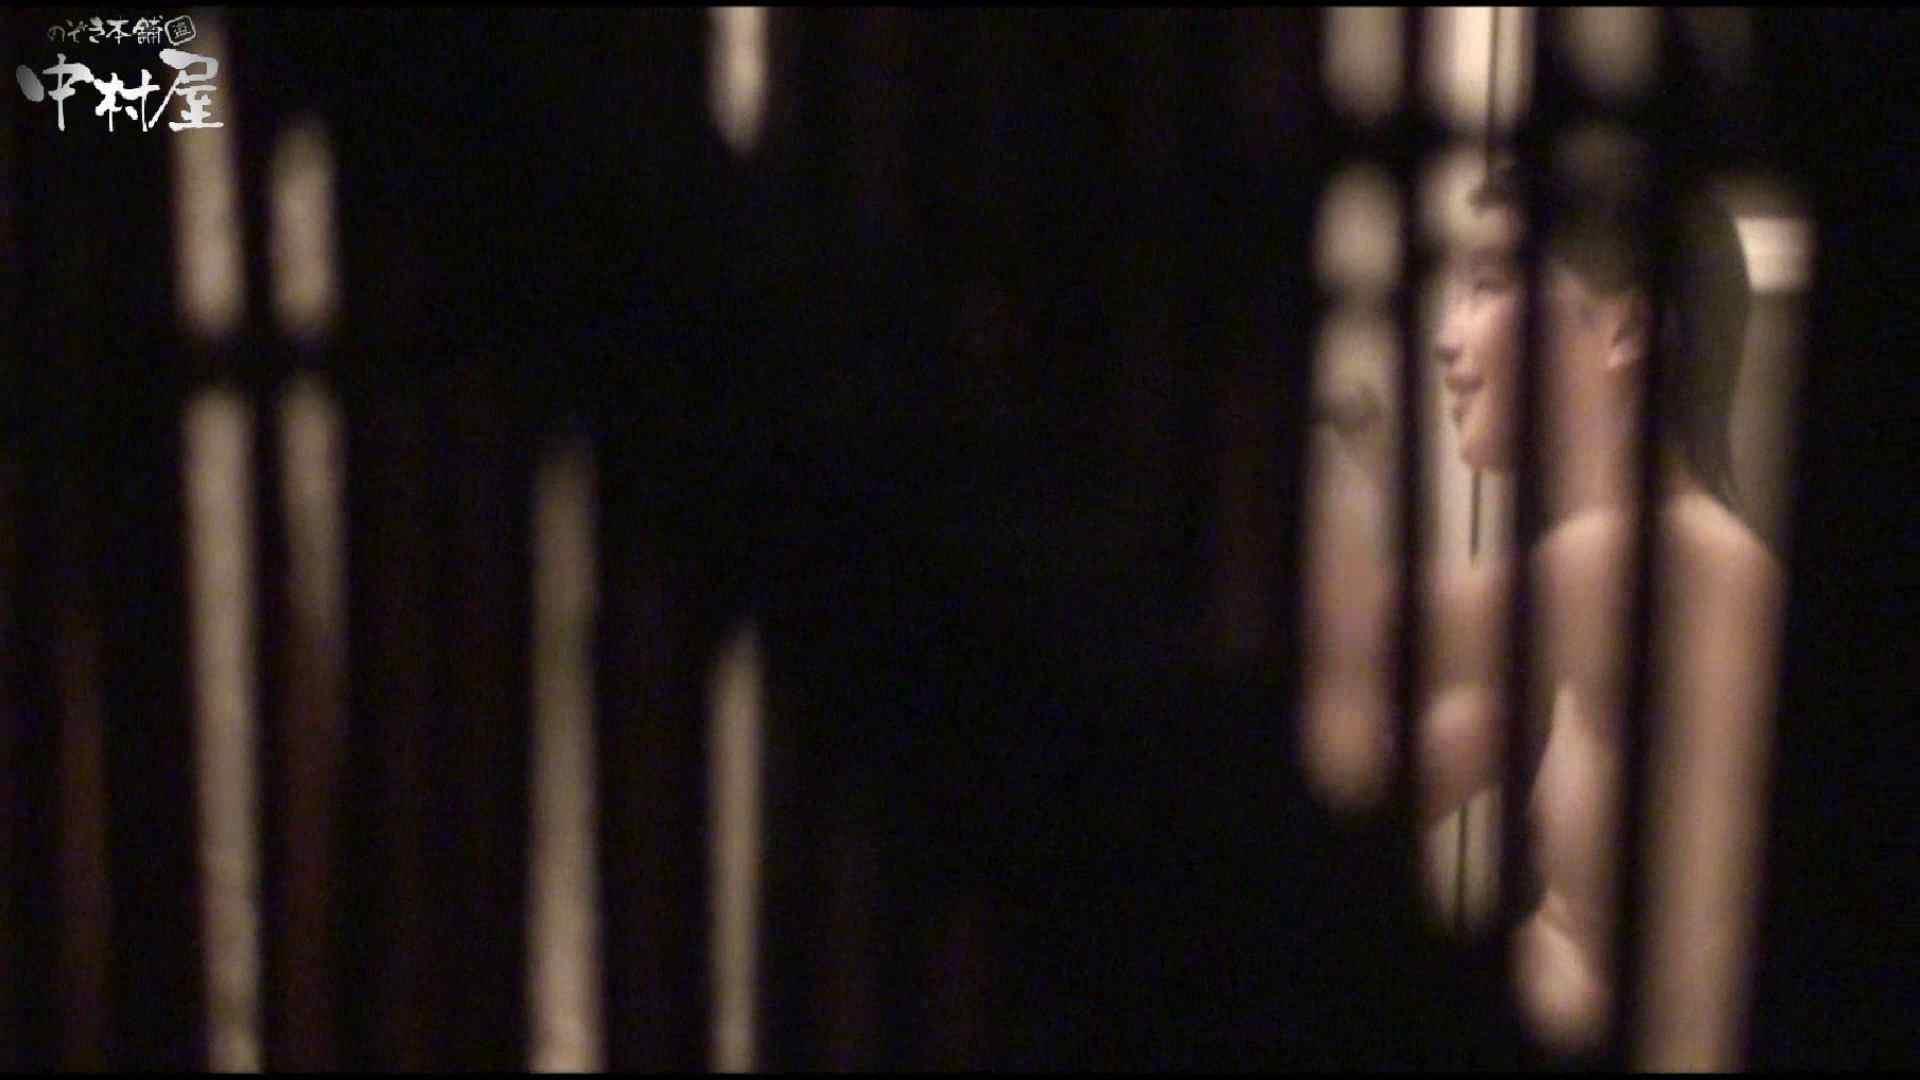 民家風呂専門盗撮師の超危険映像 vol.028 OLハメ撮り  28Pix 9